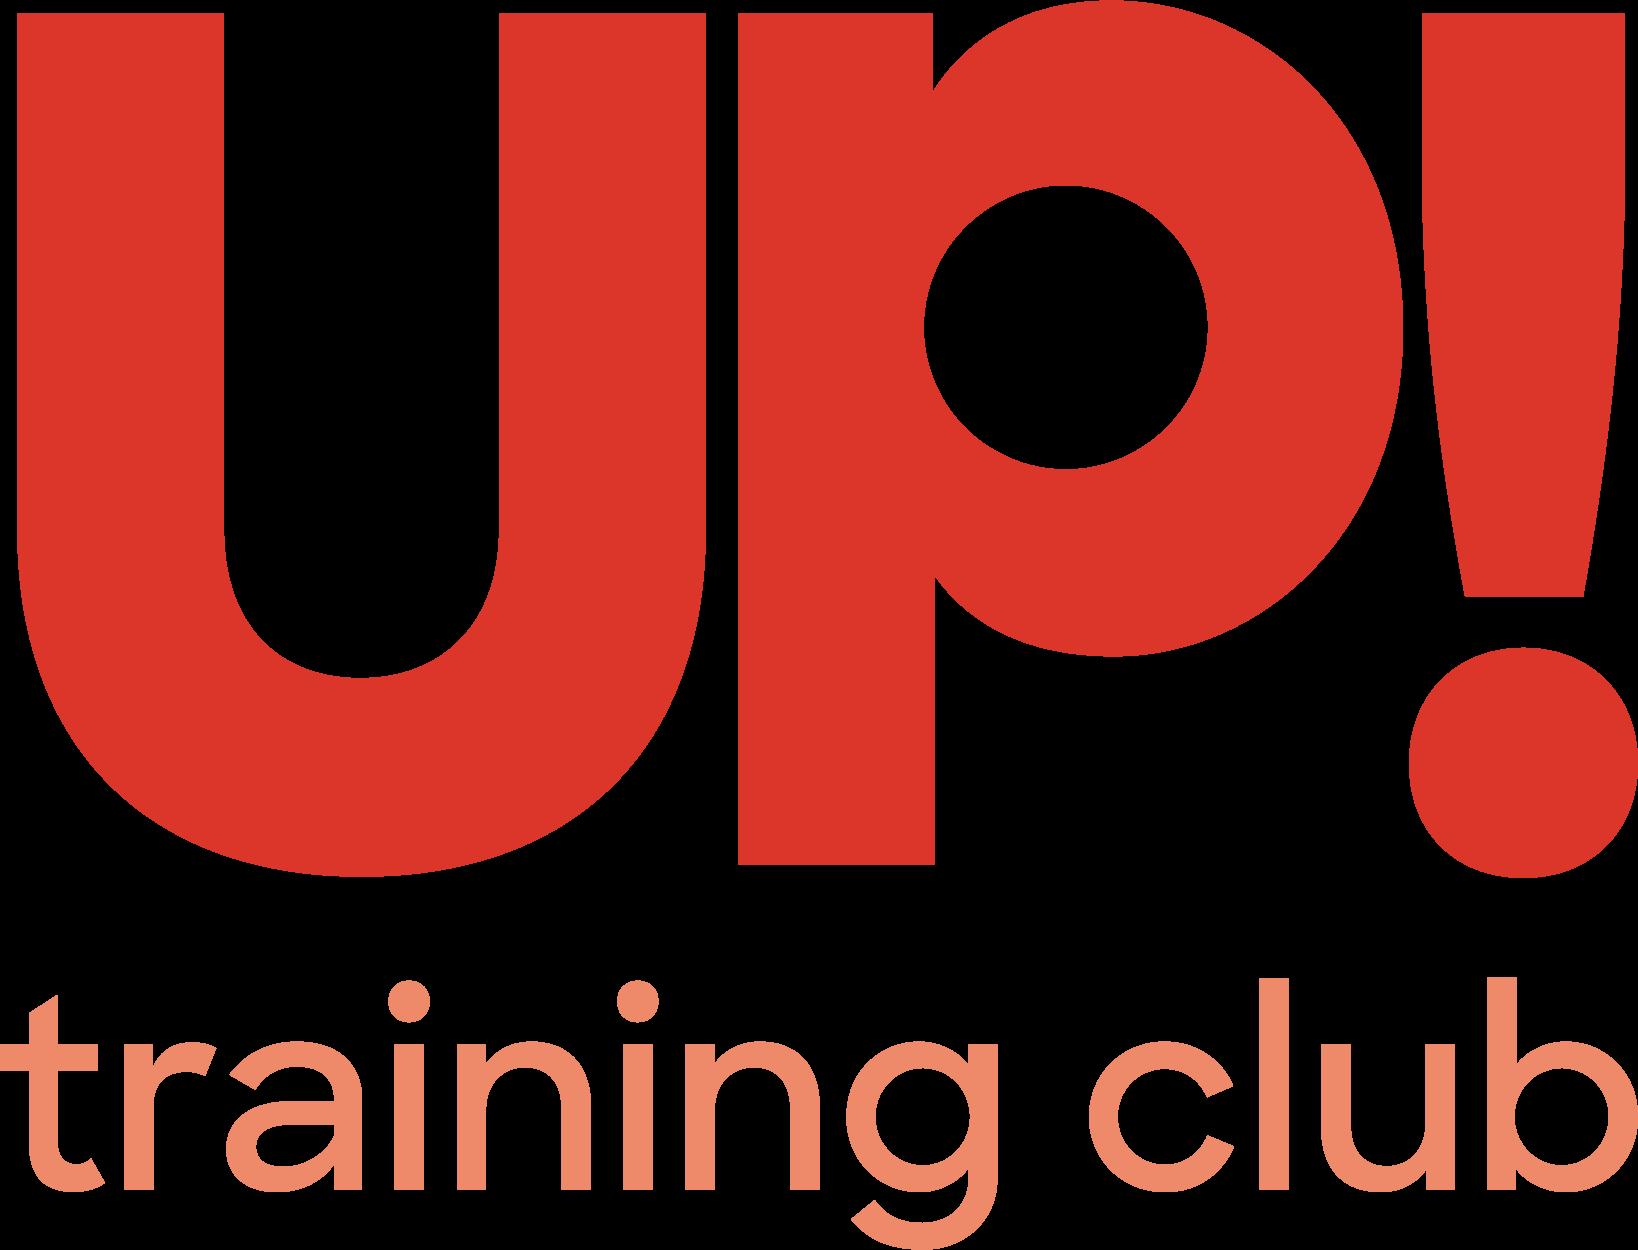 UP! TRAINING CLUB